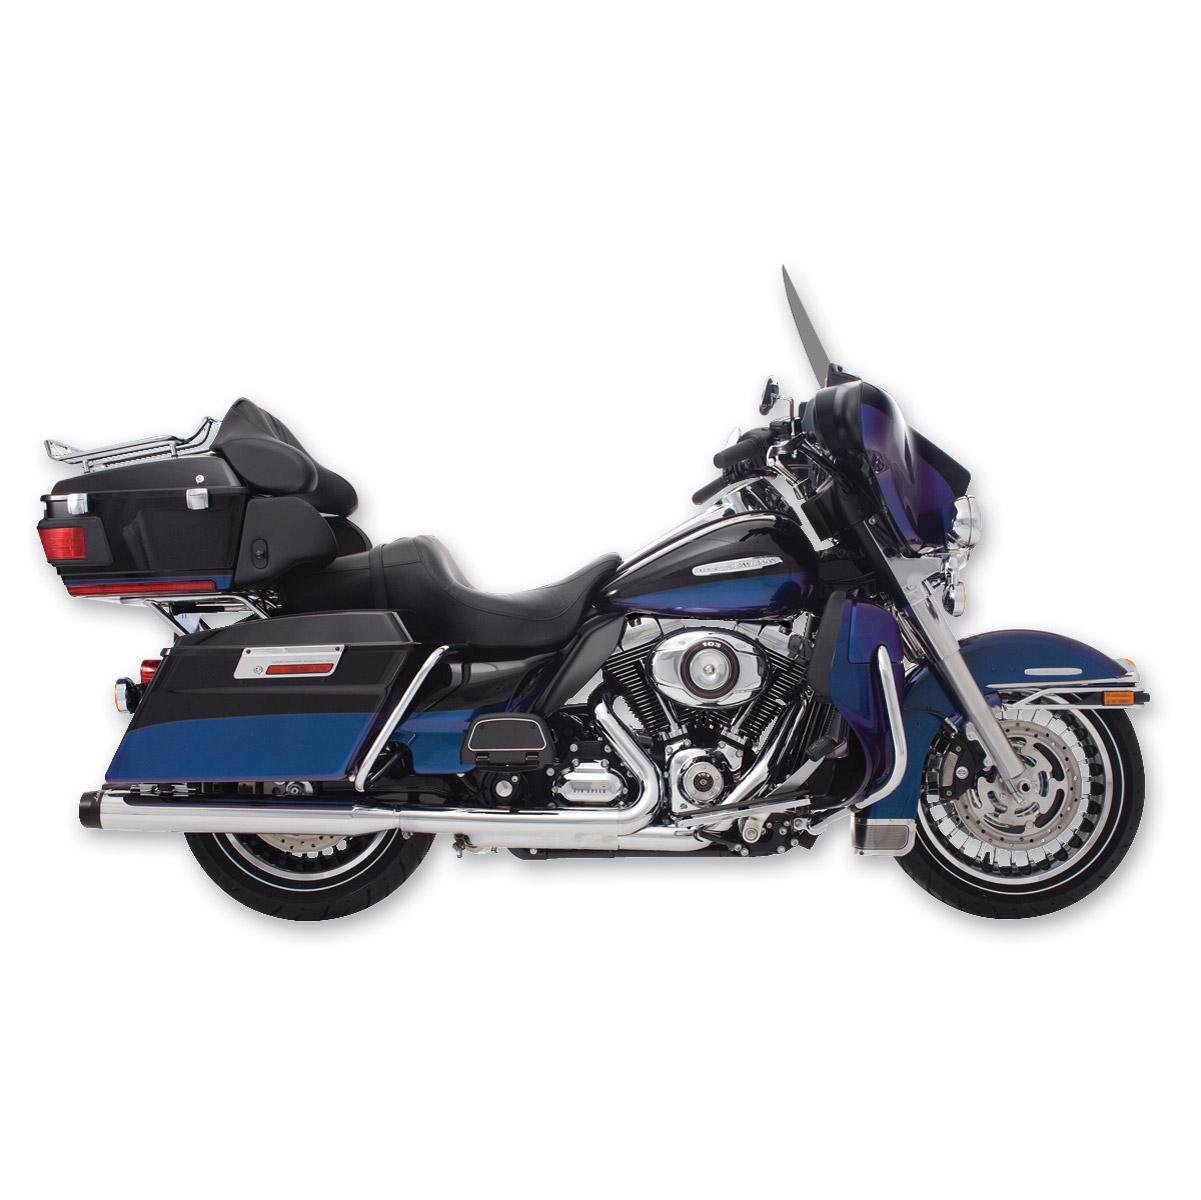 Rinehart Racing 4 Slip On Mufflers Chrome With Black End Caps 441 2000 Harley Flhpi Wiring Diagram